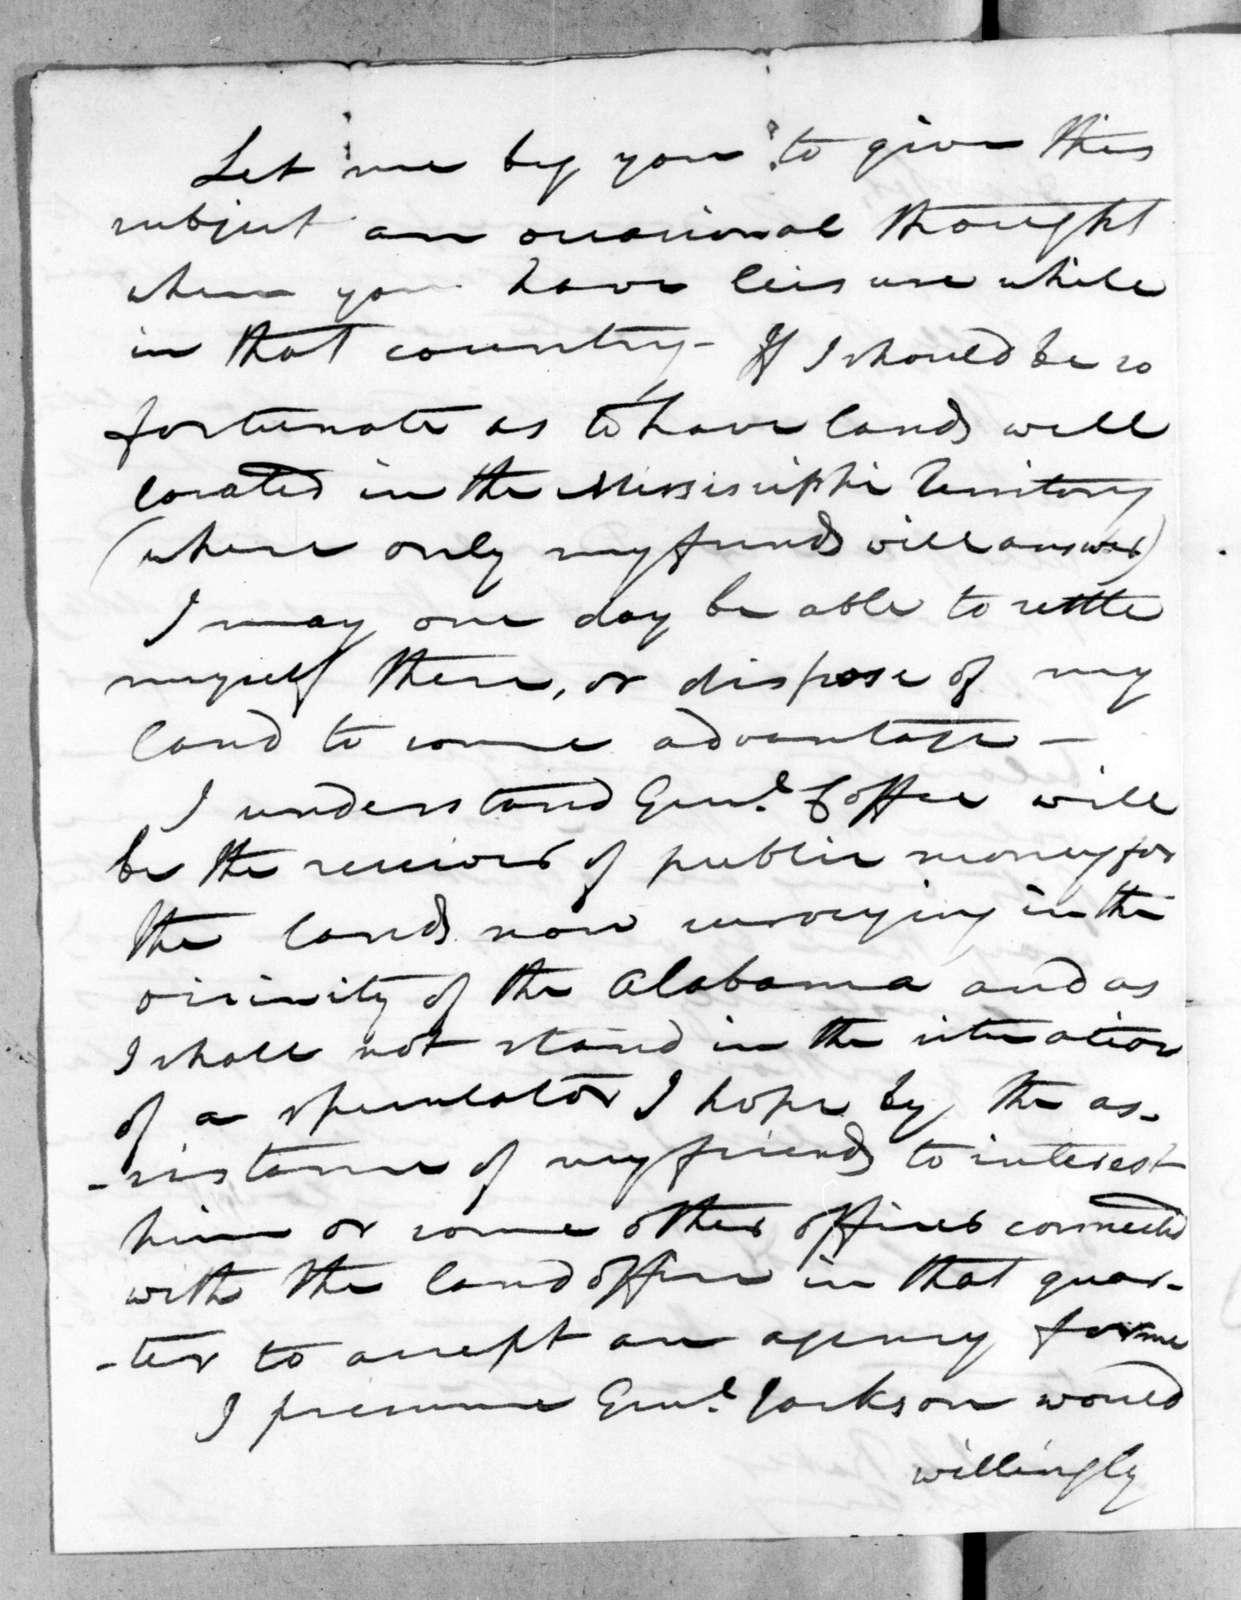 Daniel Parker to Isaac Lewis Baker, August 29, 1816